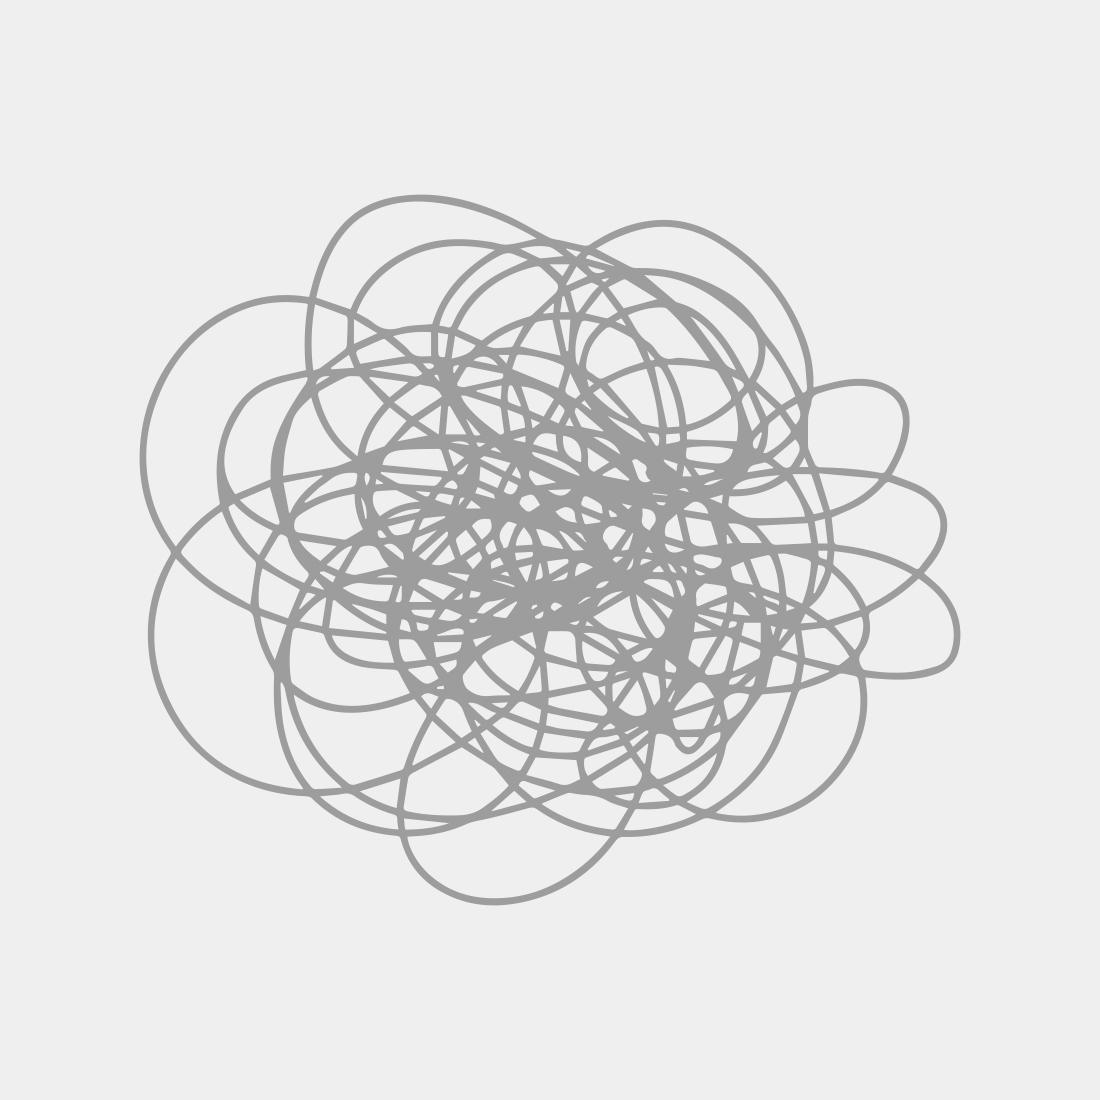 Albert Irvin OBE RA Untitled opus w.36